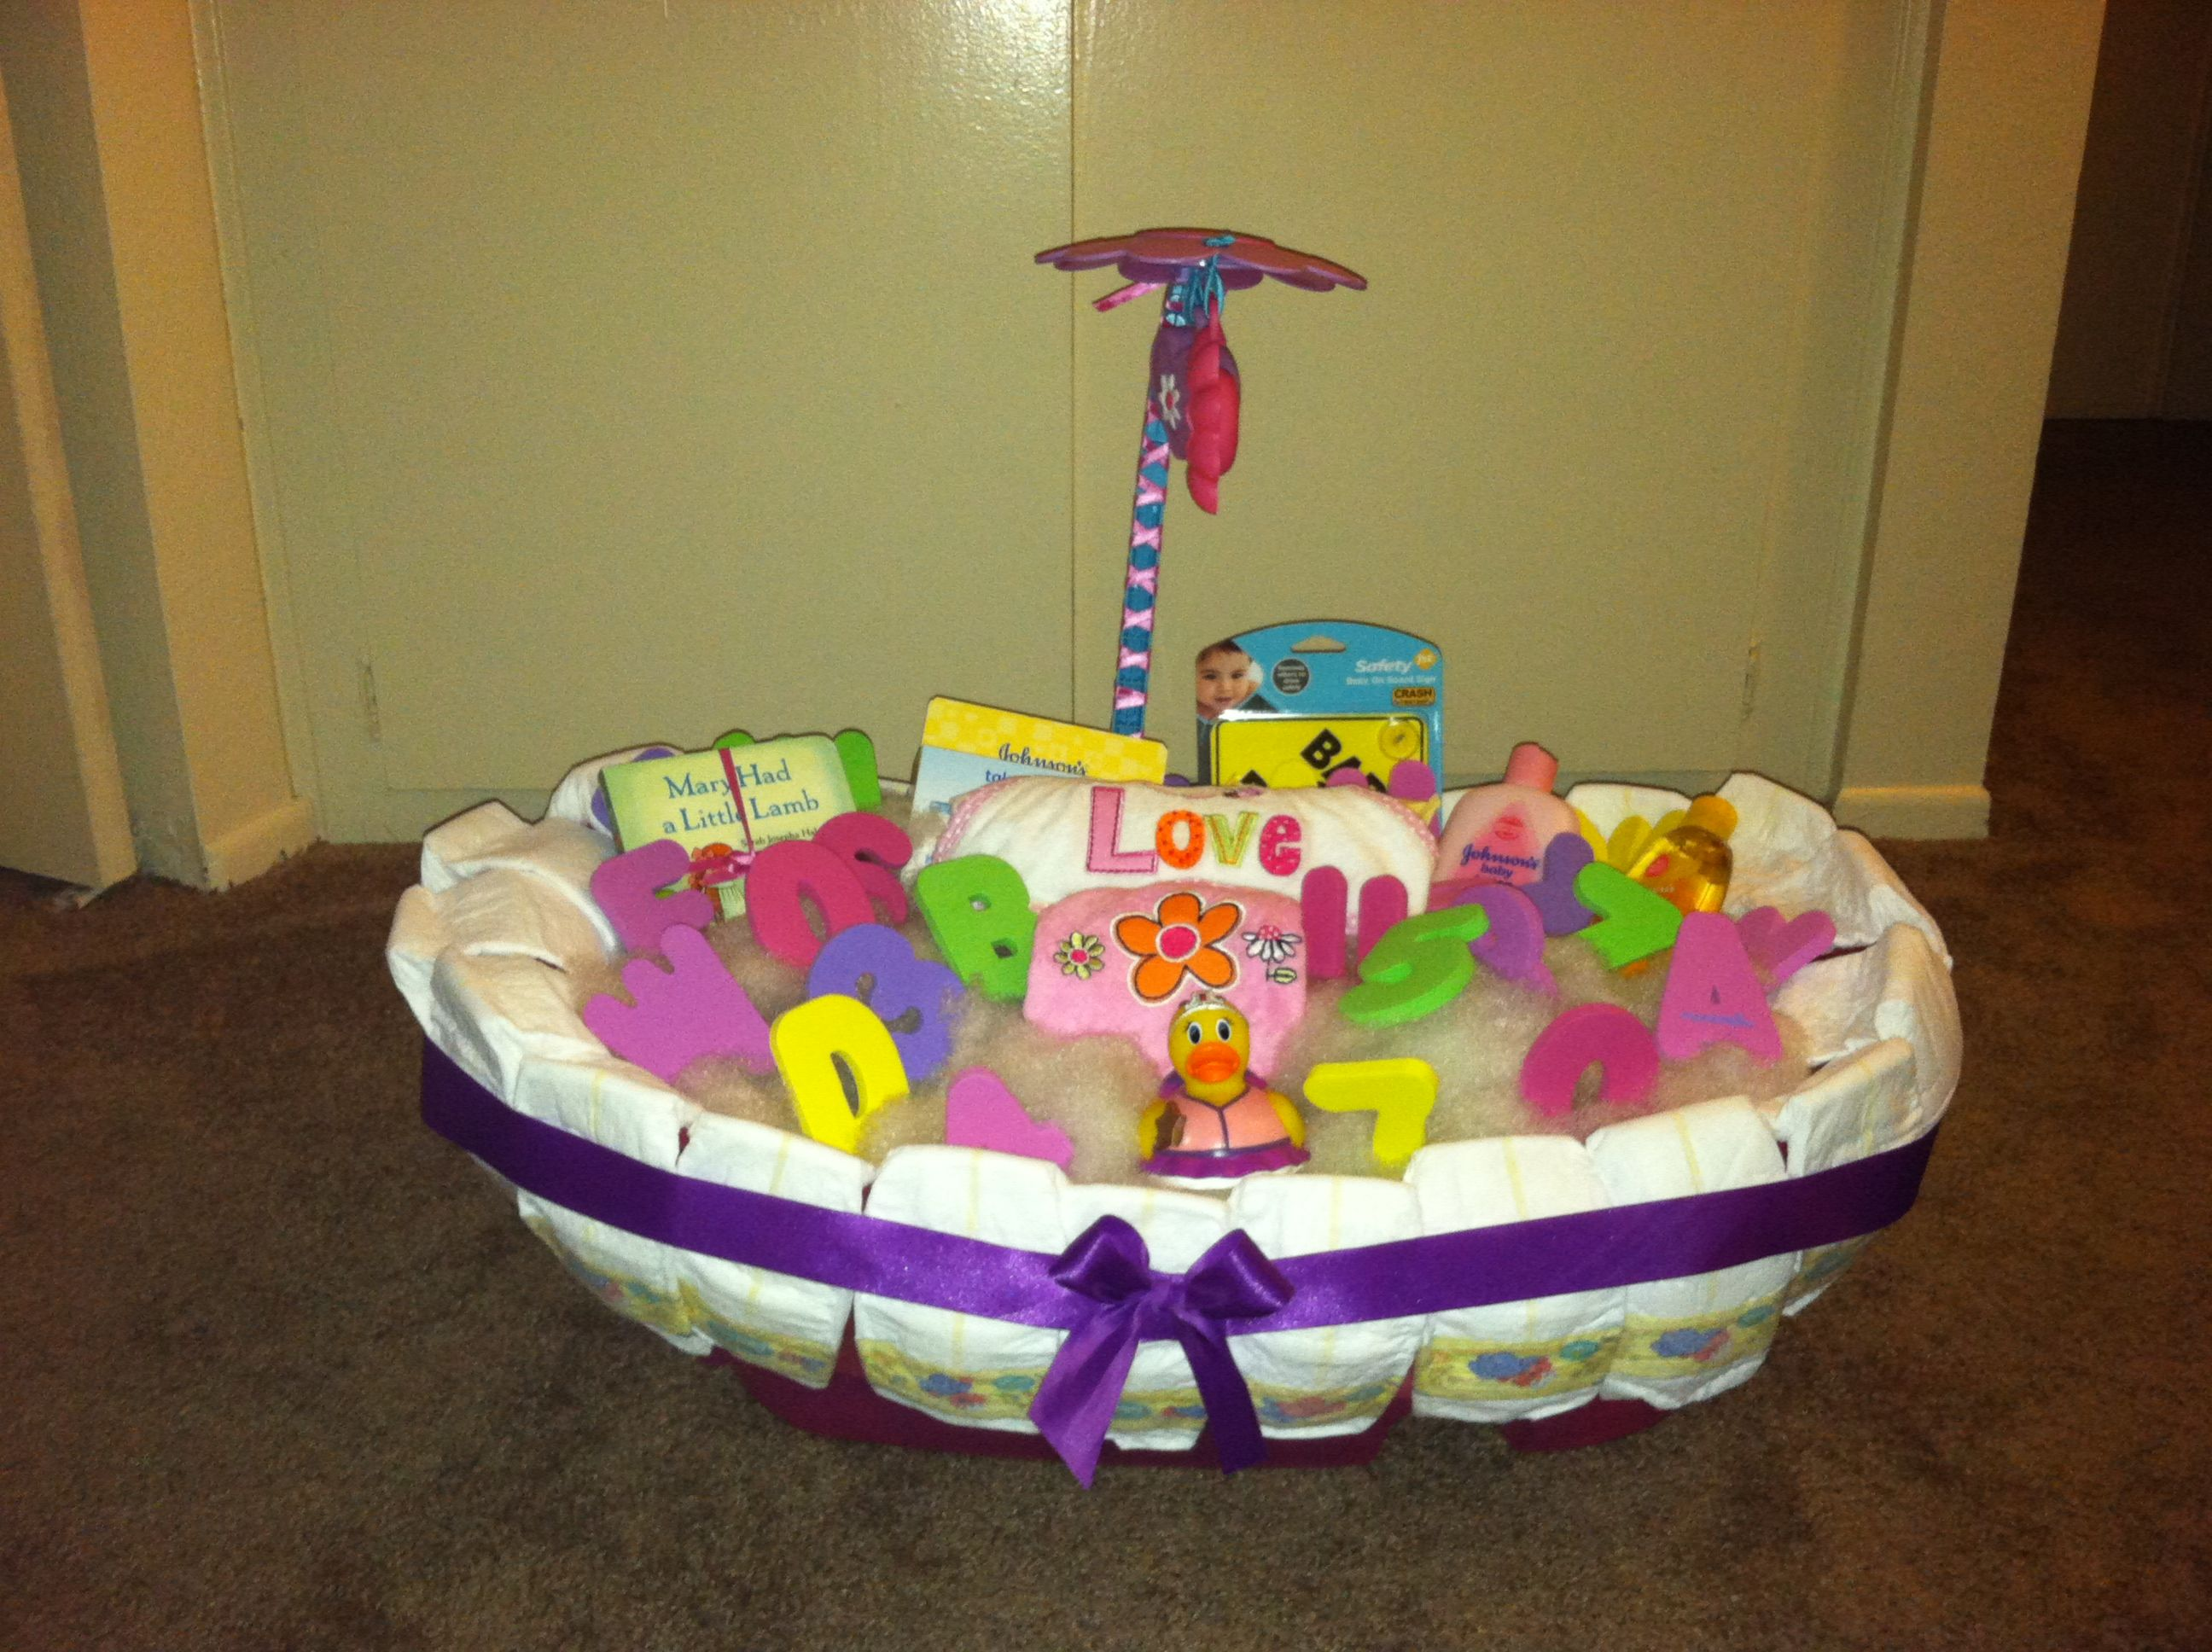 DIY Diaper bath tub | DIY gift ideas | Pinterest | Diy diapers ...